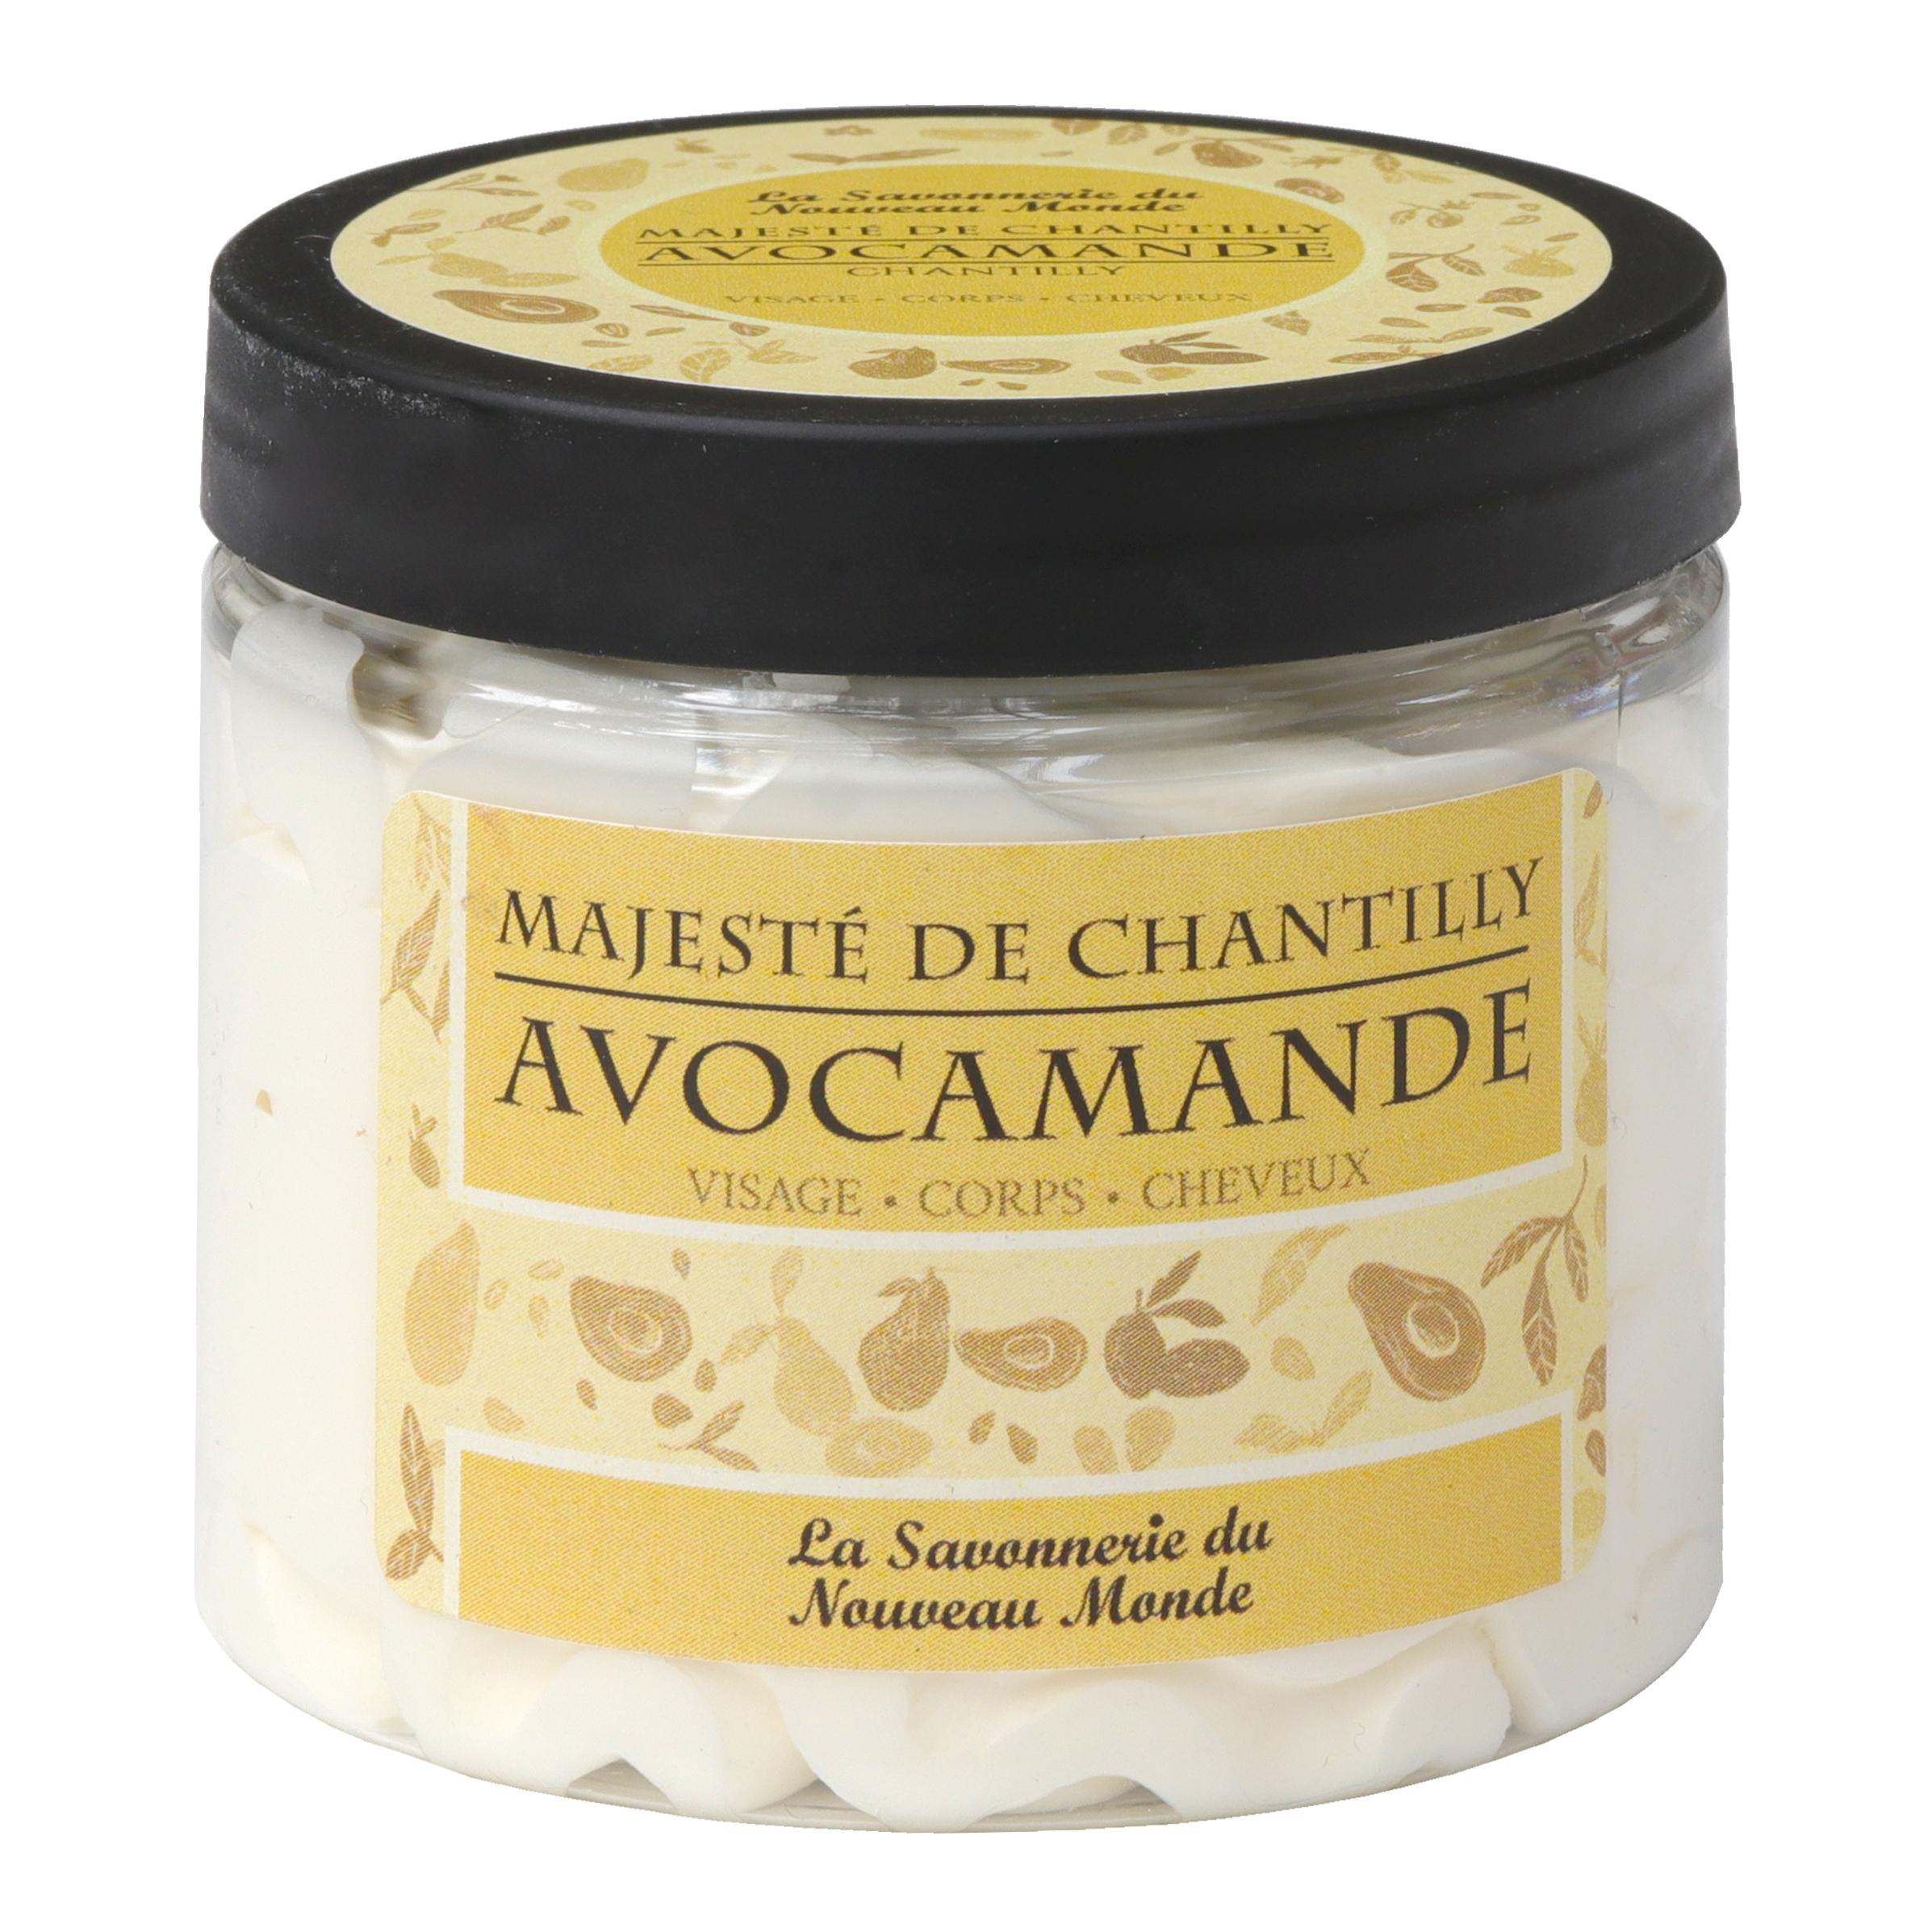 la Savonnerie du Nouveau Monde - Avocamande - Majeste de chantilly